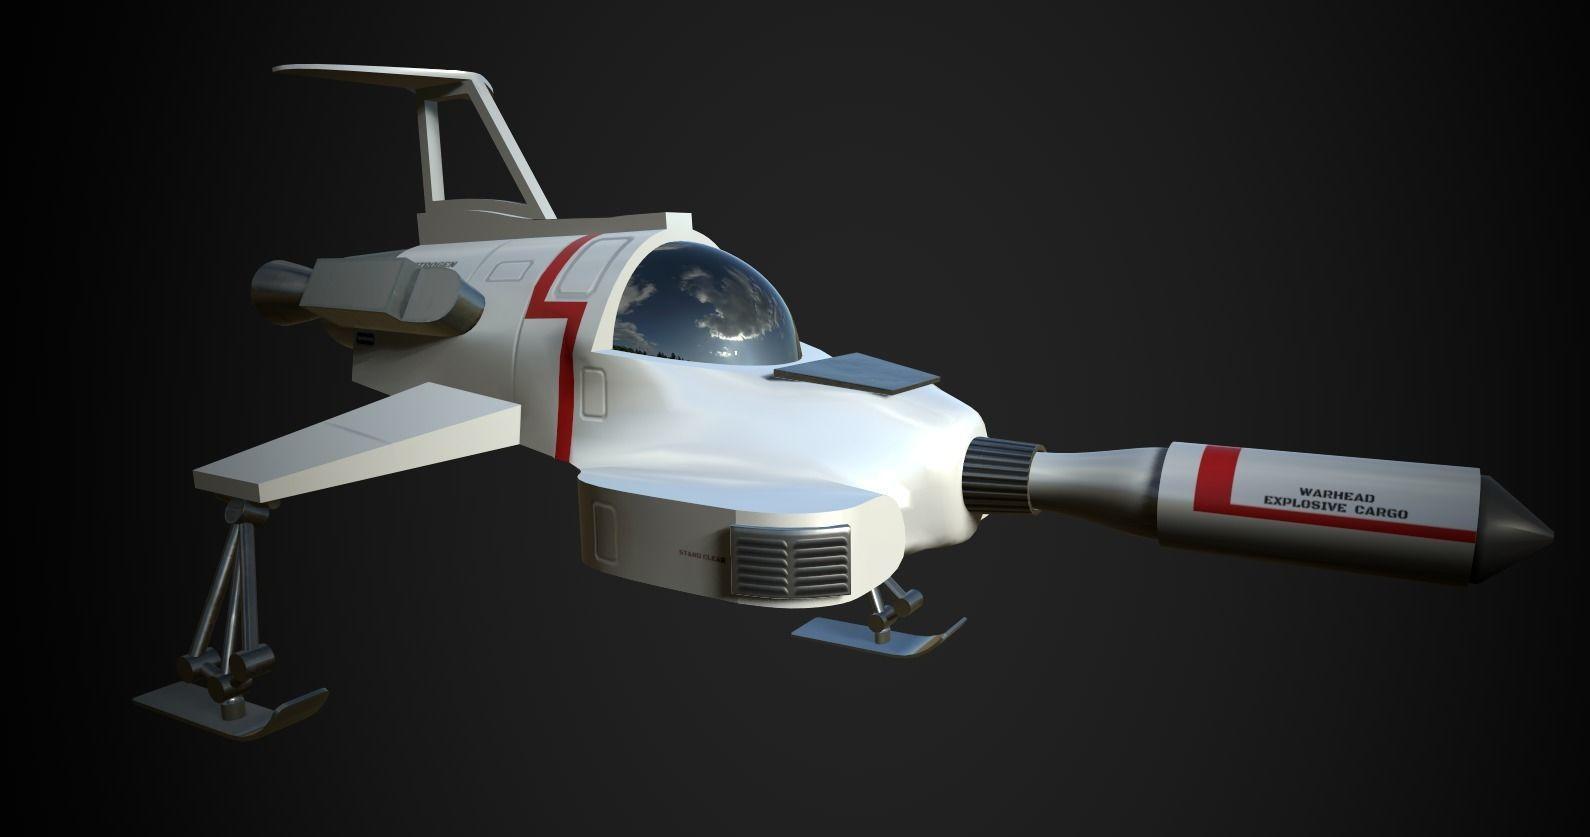 UFO Interceptor-stylised model from the TV show